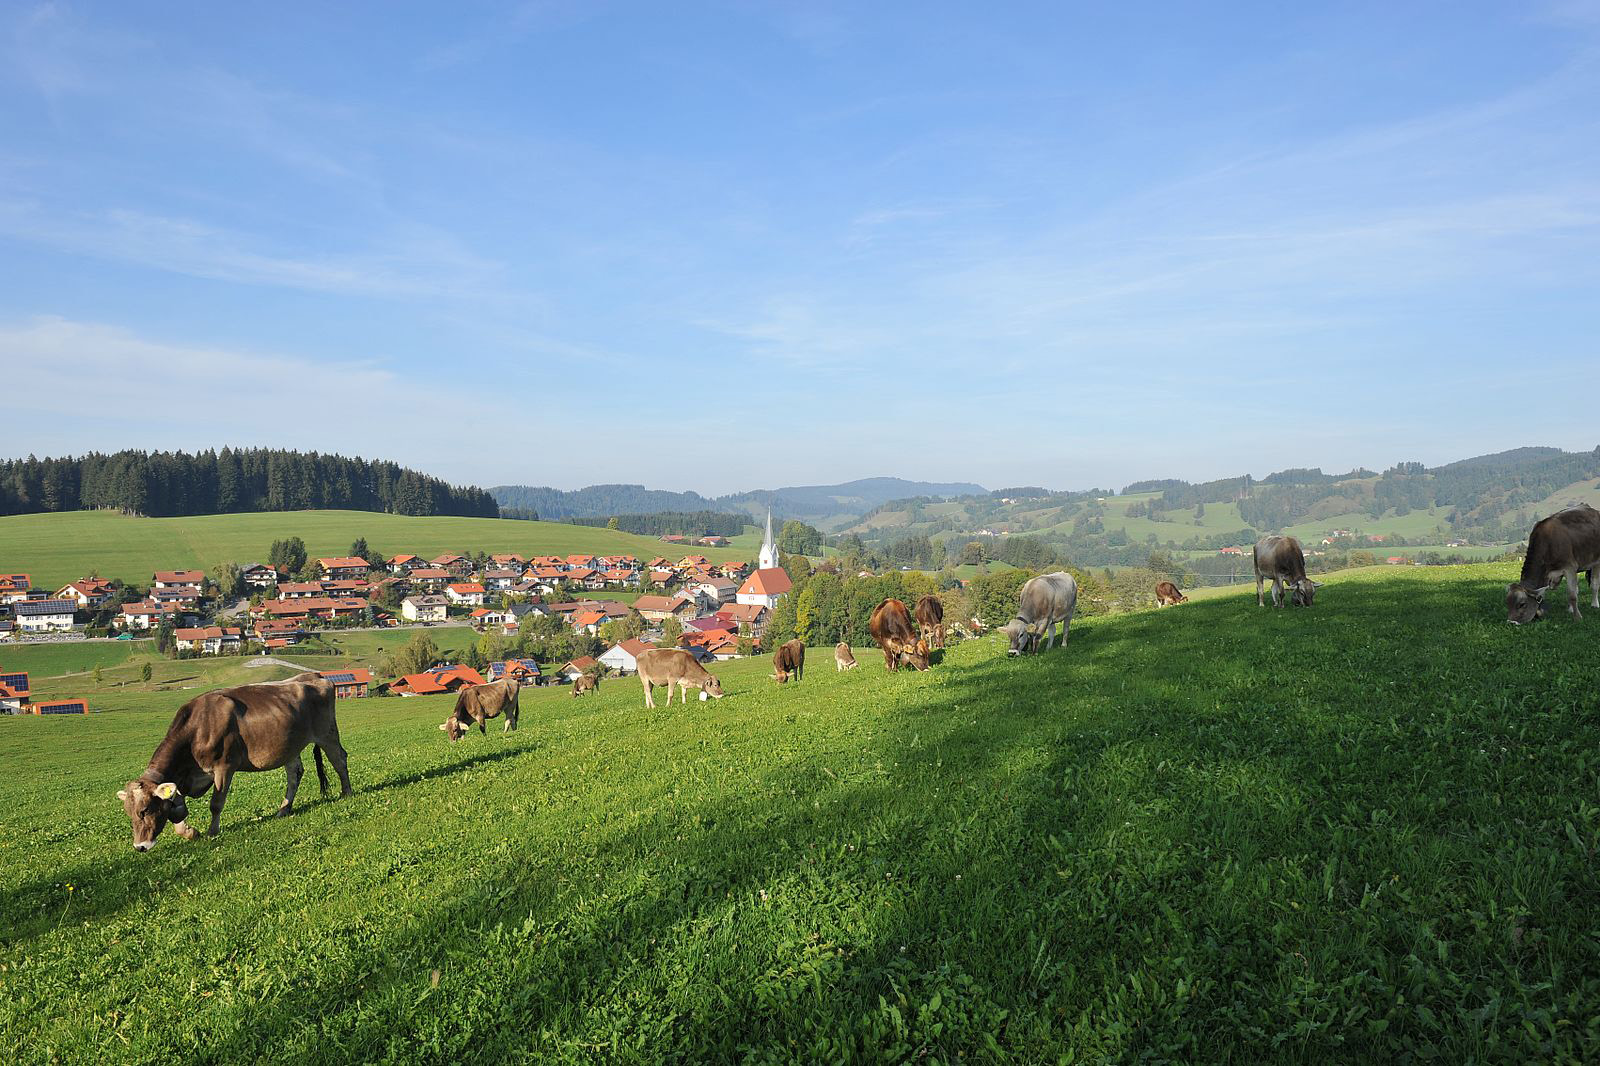 Milkana Kühe Wiese Landschaft Allgäu